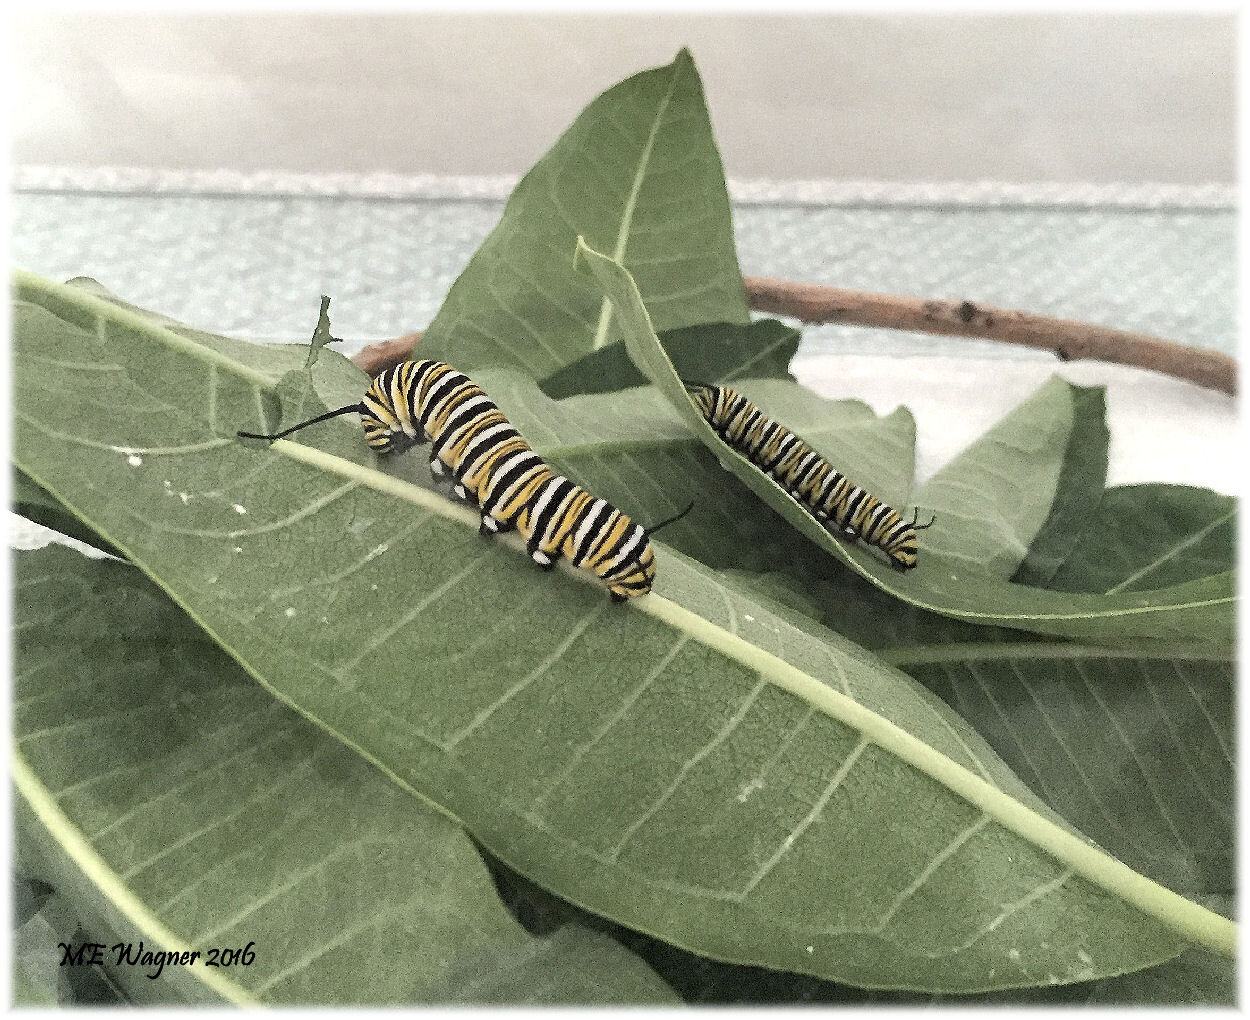 4th and 5th instar monarch,  Danaus plexippus,  caterpillars being raised indoors feeding on common milkweed,  Asclepais syriaca .    Photograph courtesy of Mary Ann Wagner